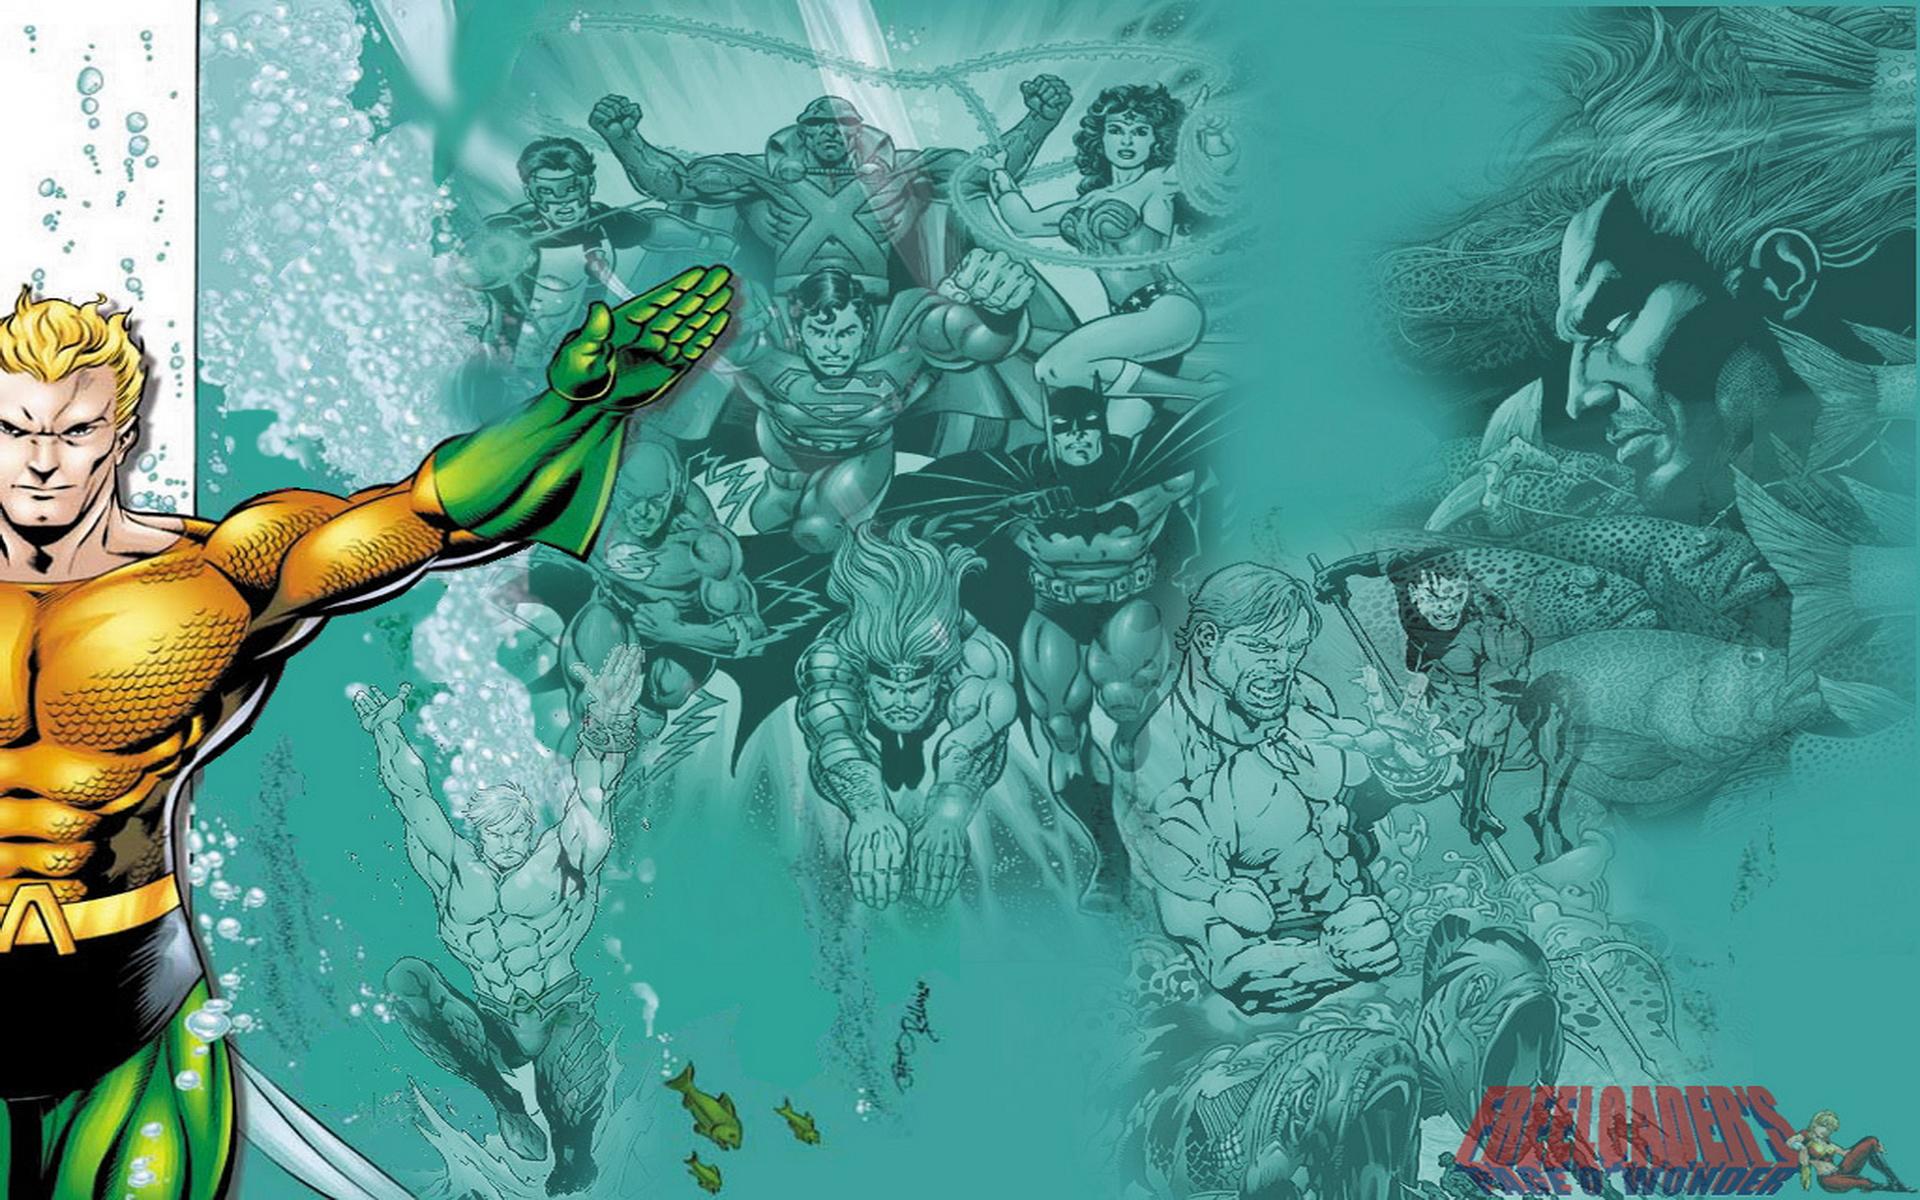 Wallpaper DC Comics Wallpaper Picture Desktop Wallpaper Background 1920x1200